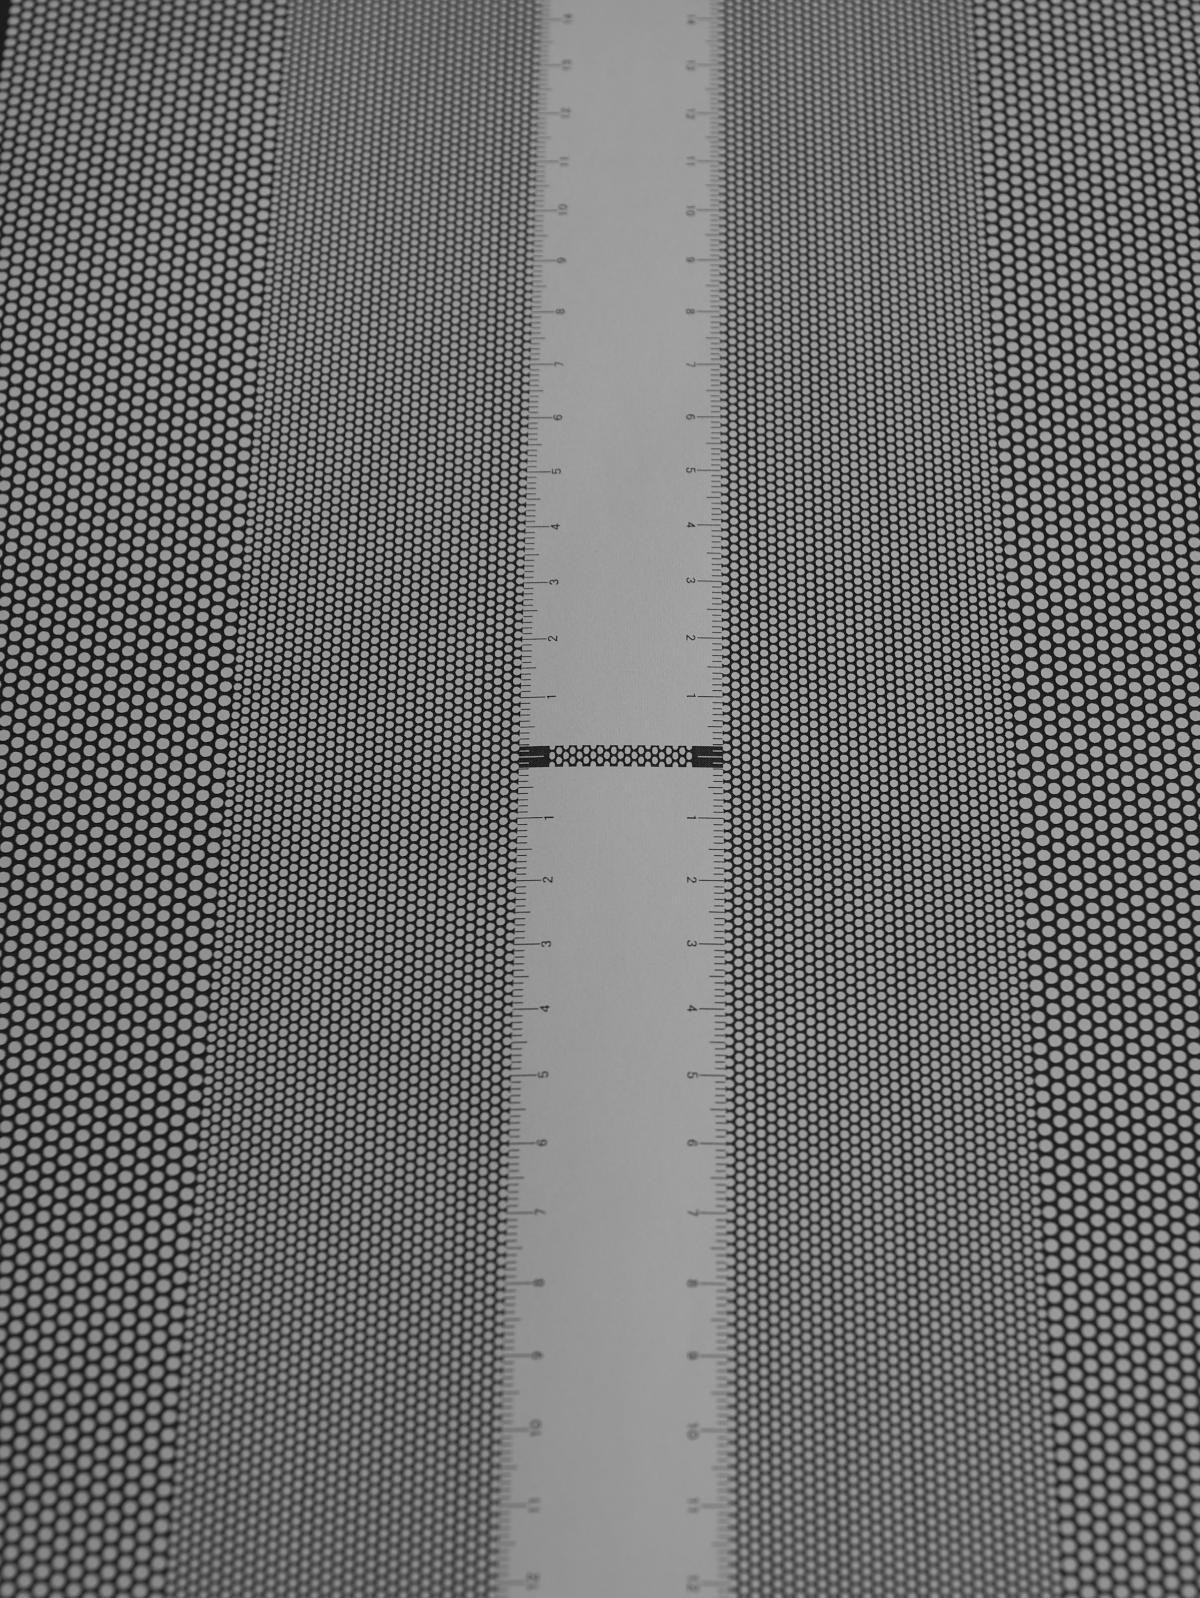 Flektogon 35mm F2.8 (中期型・ゼブラ模様) レンズ性能_b0161171_1713065.jpg